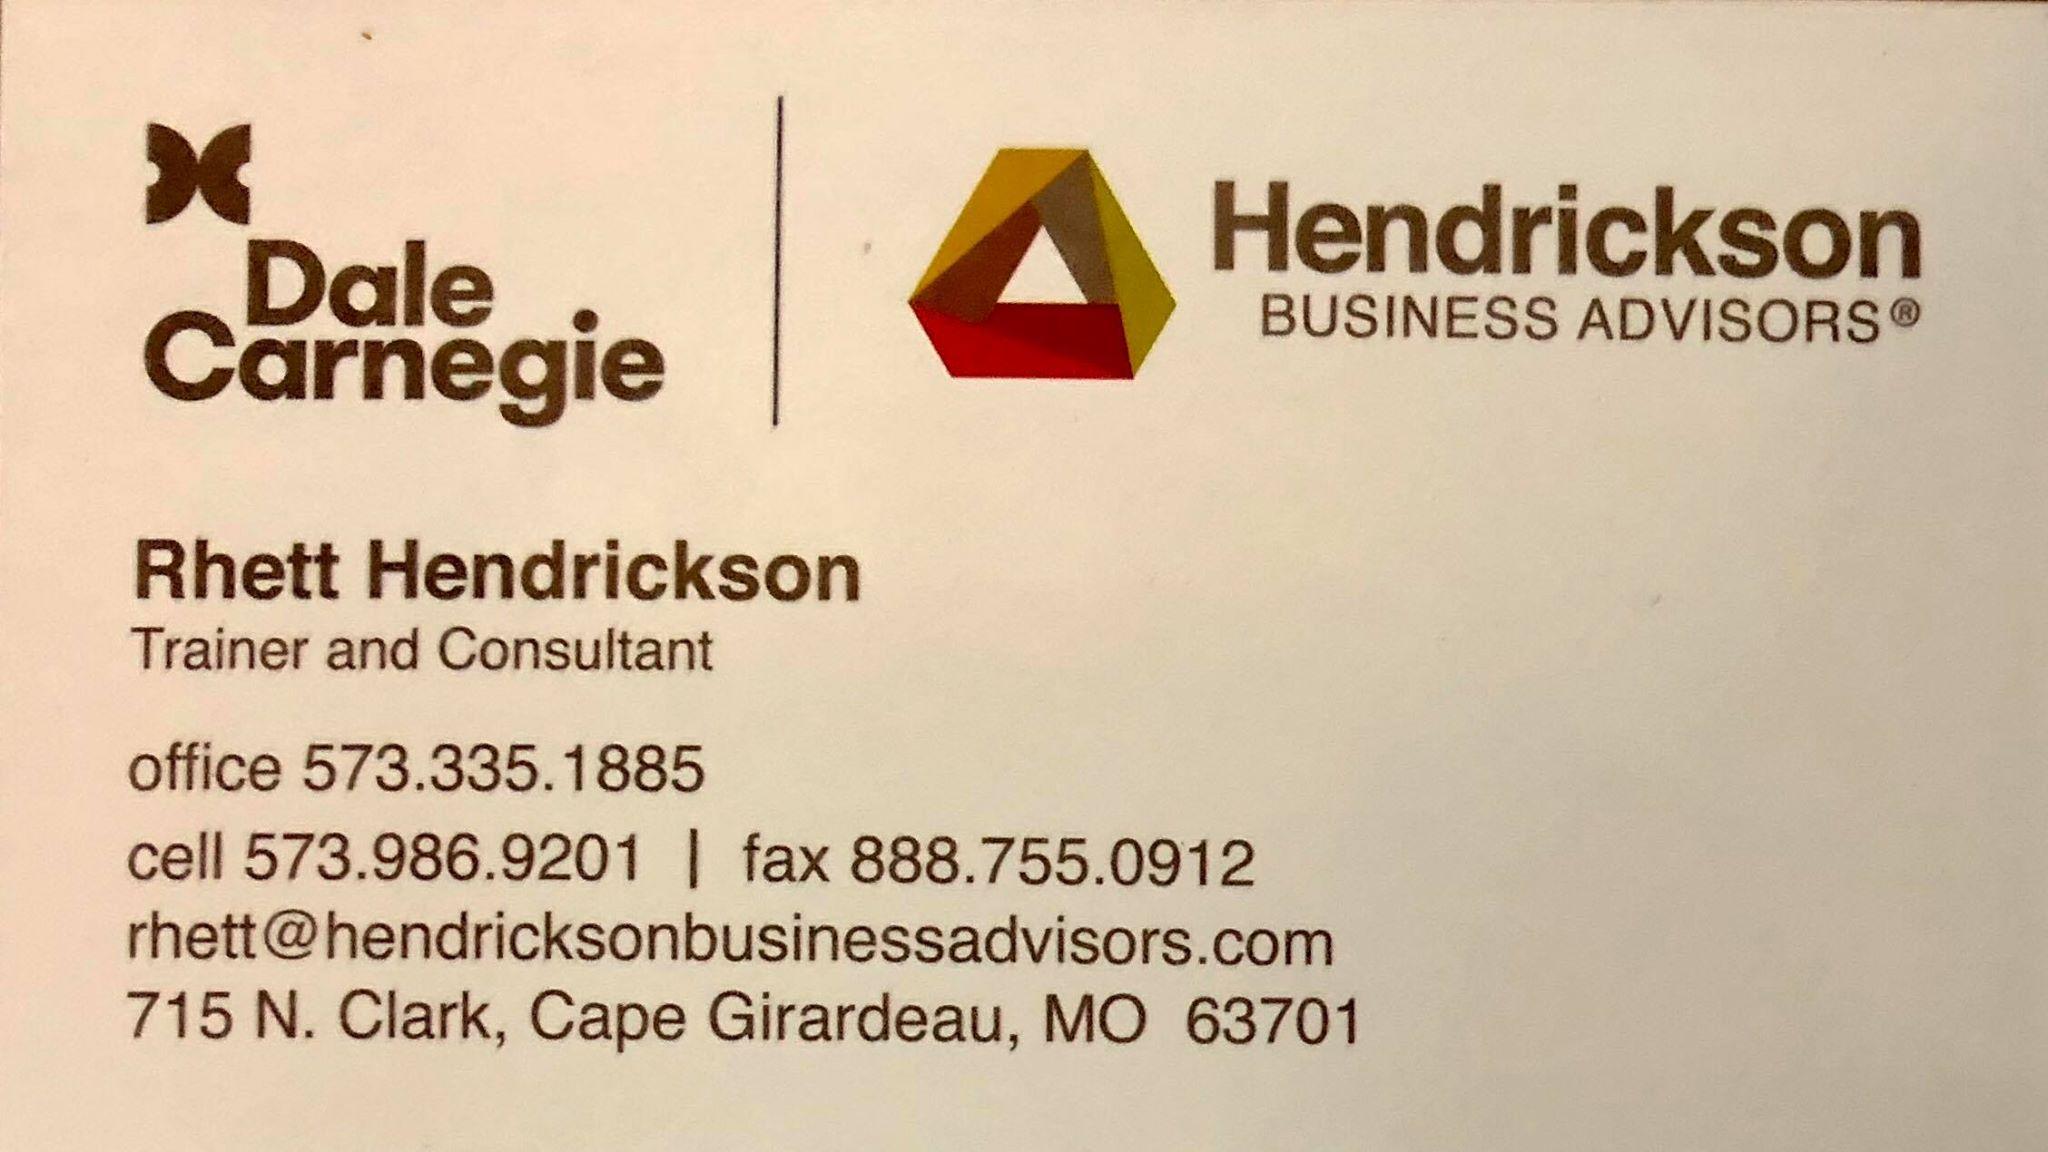 Rhett Hendrickson